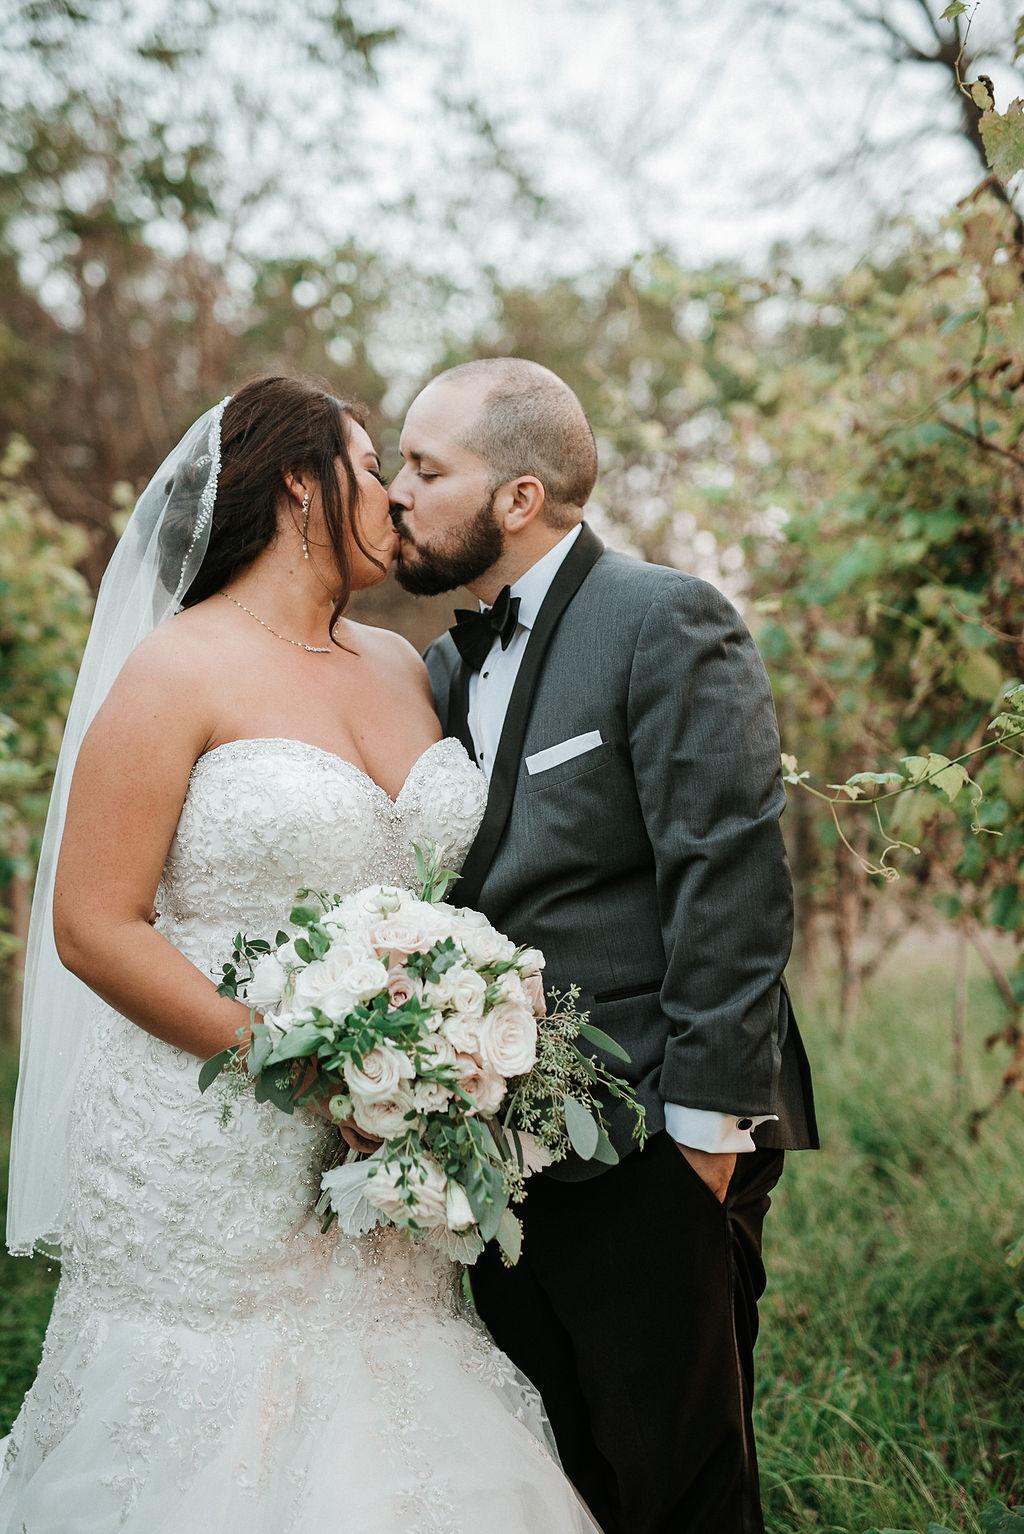 Bride and Groom Kissing in the Vineyards at Blue Valley Vineyard